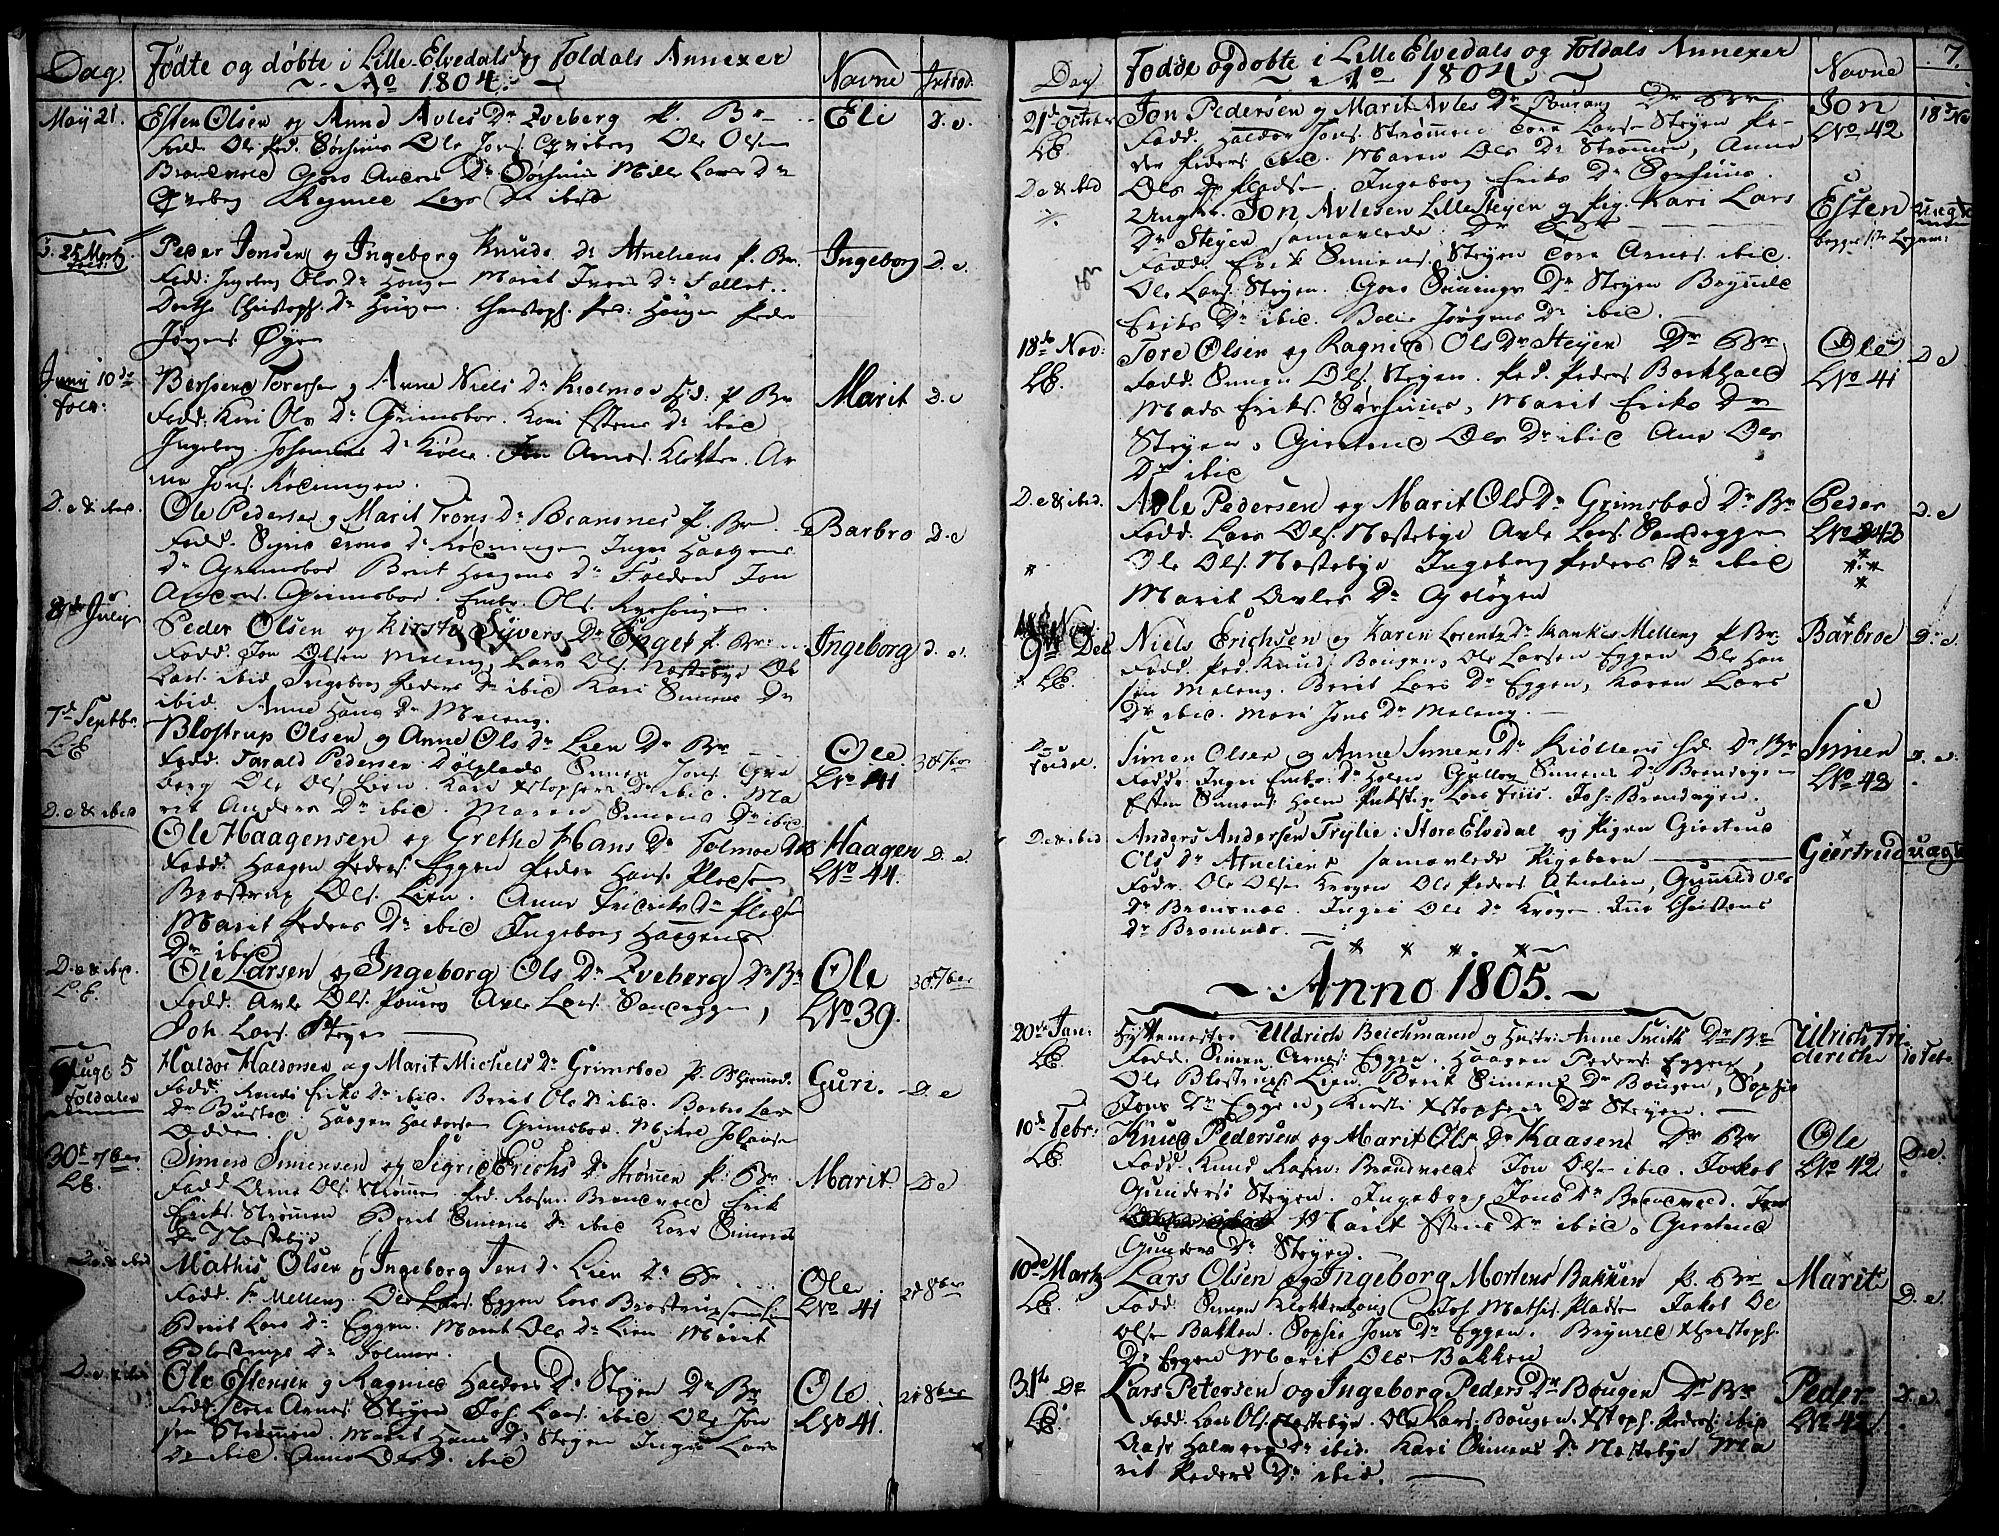 SAH, Tynset prestekontor, Ministerialbok nr. 16, 1801-1814, s. 7